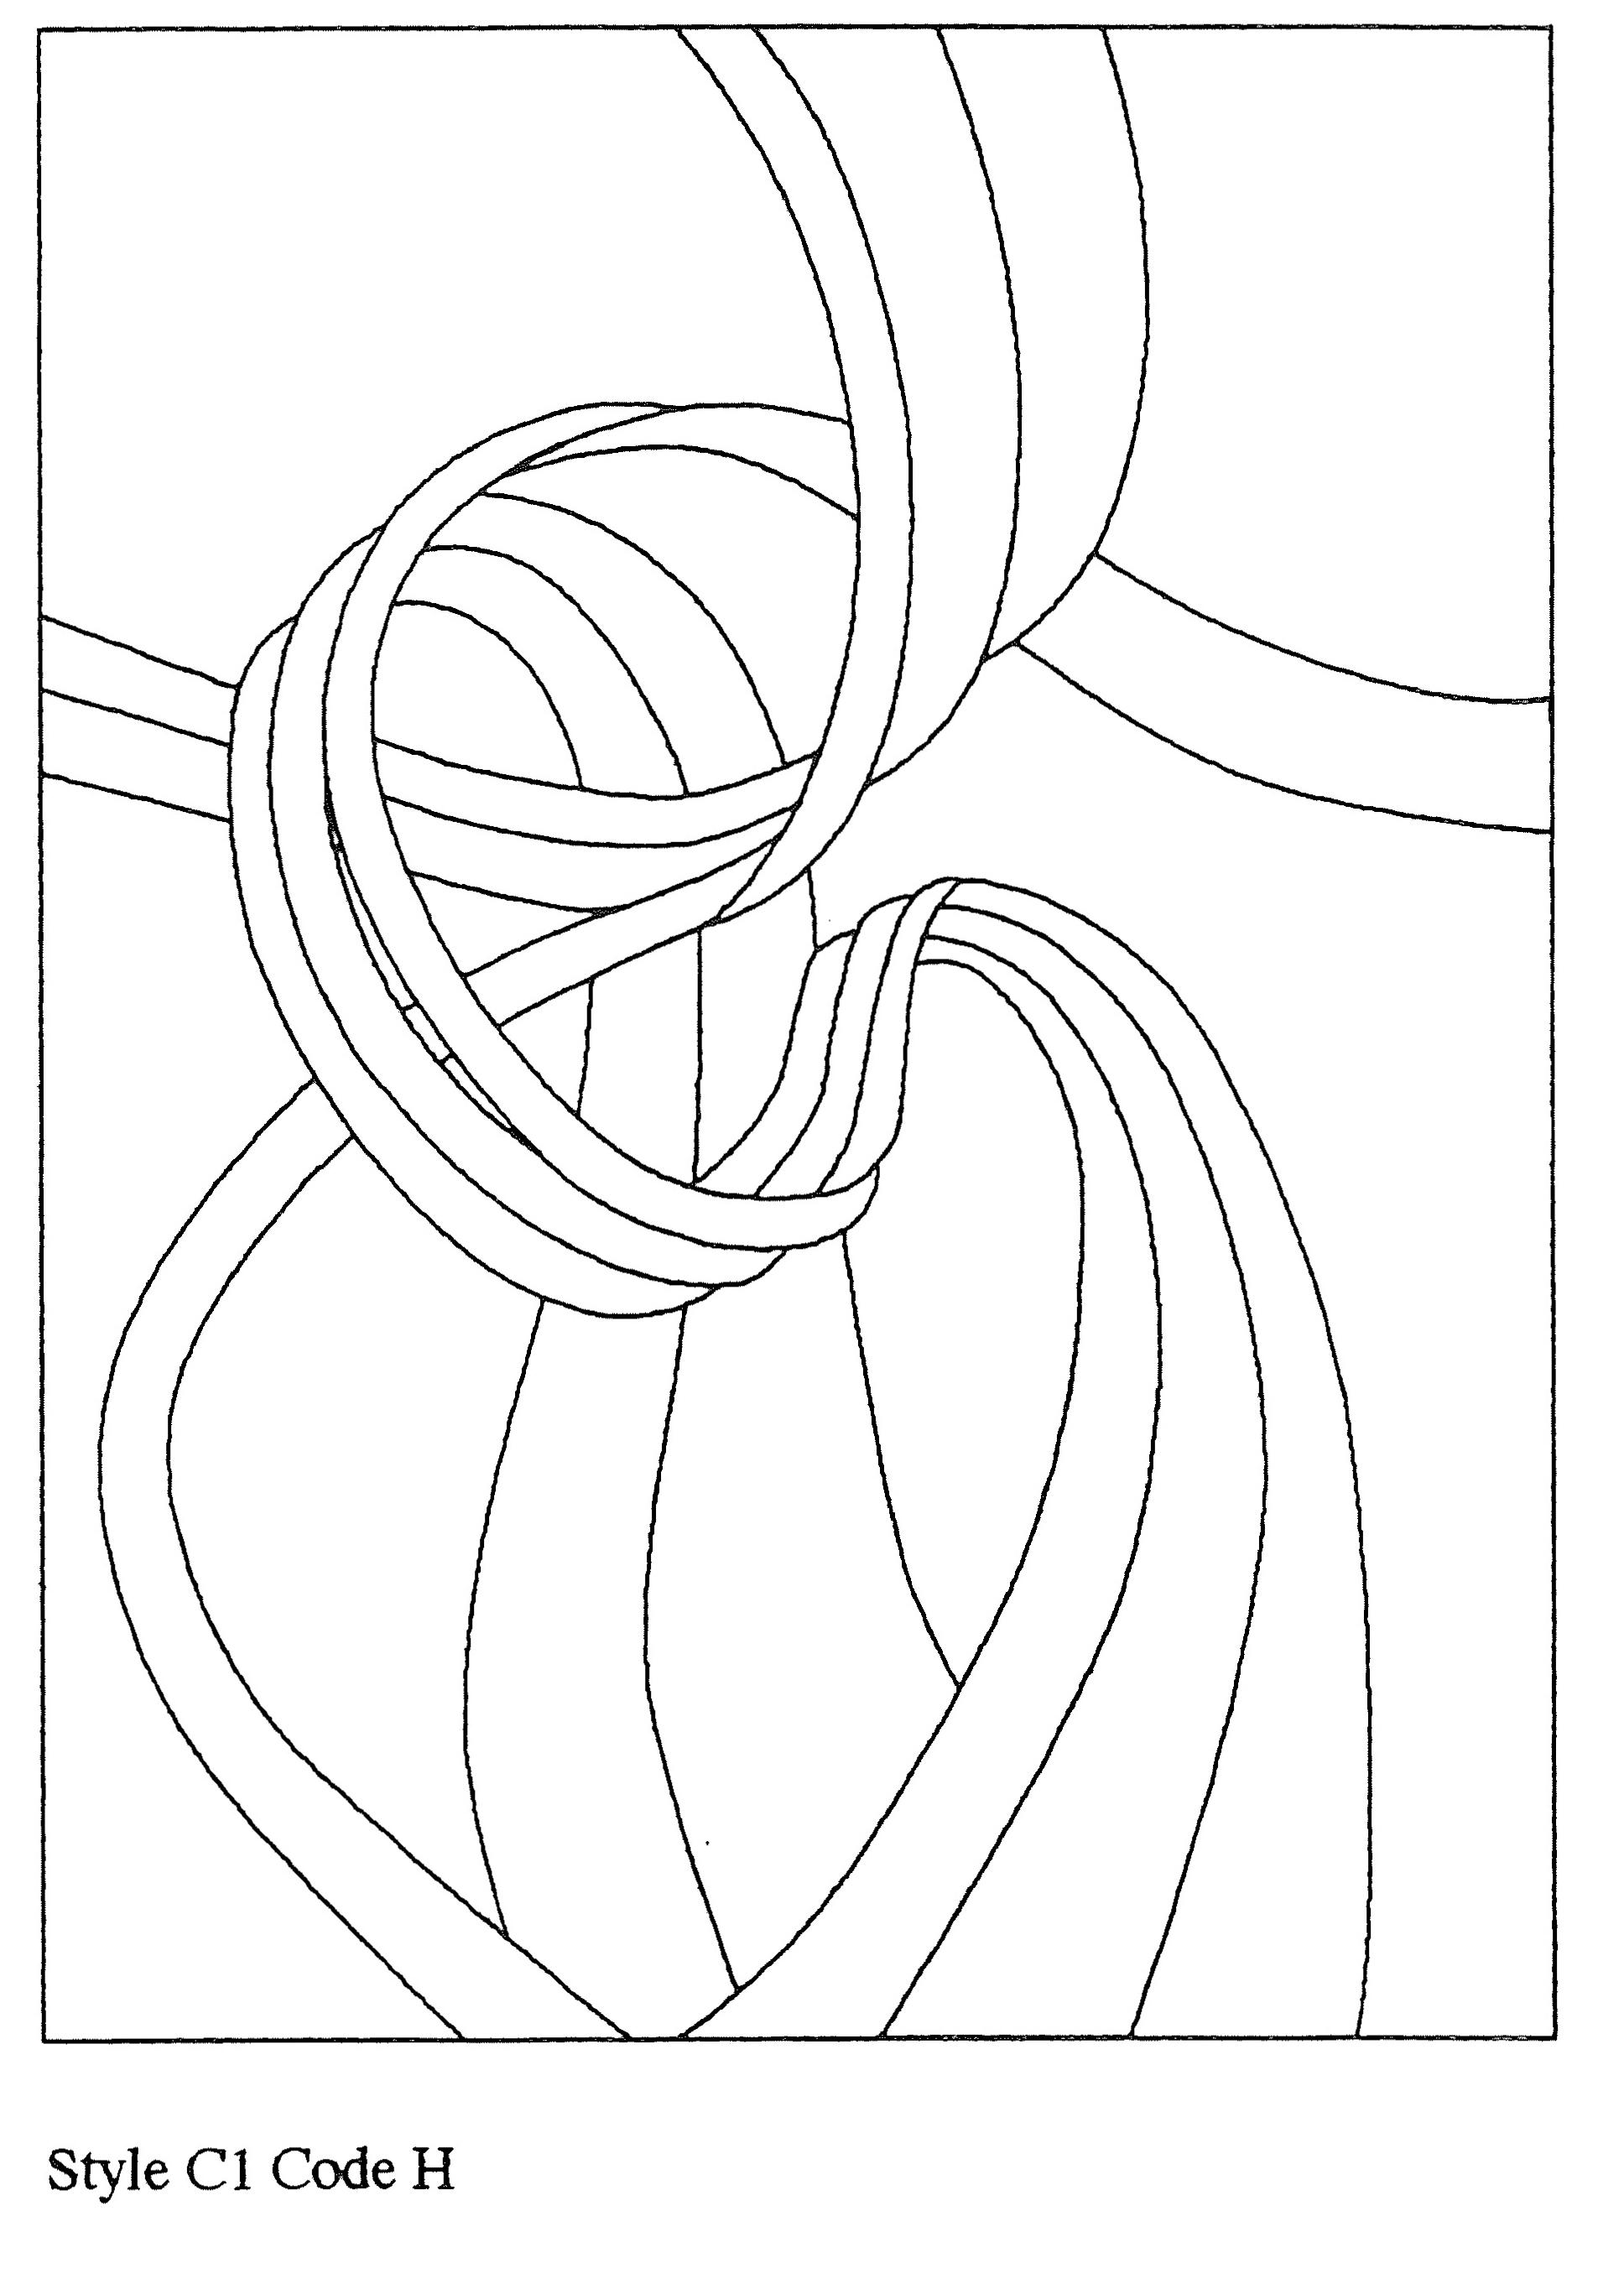 Page 8 copy 3.jpg